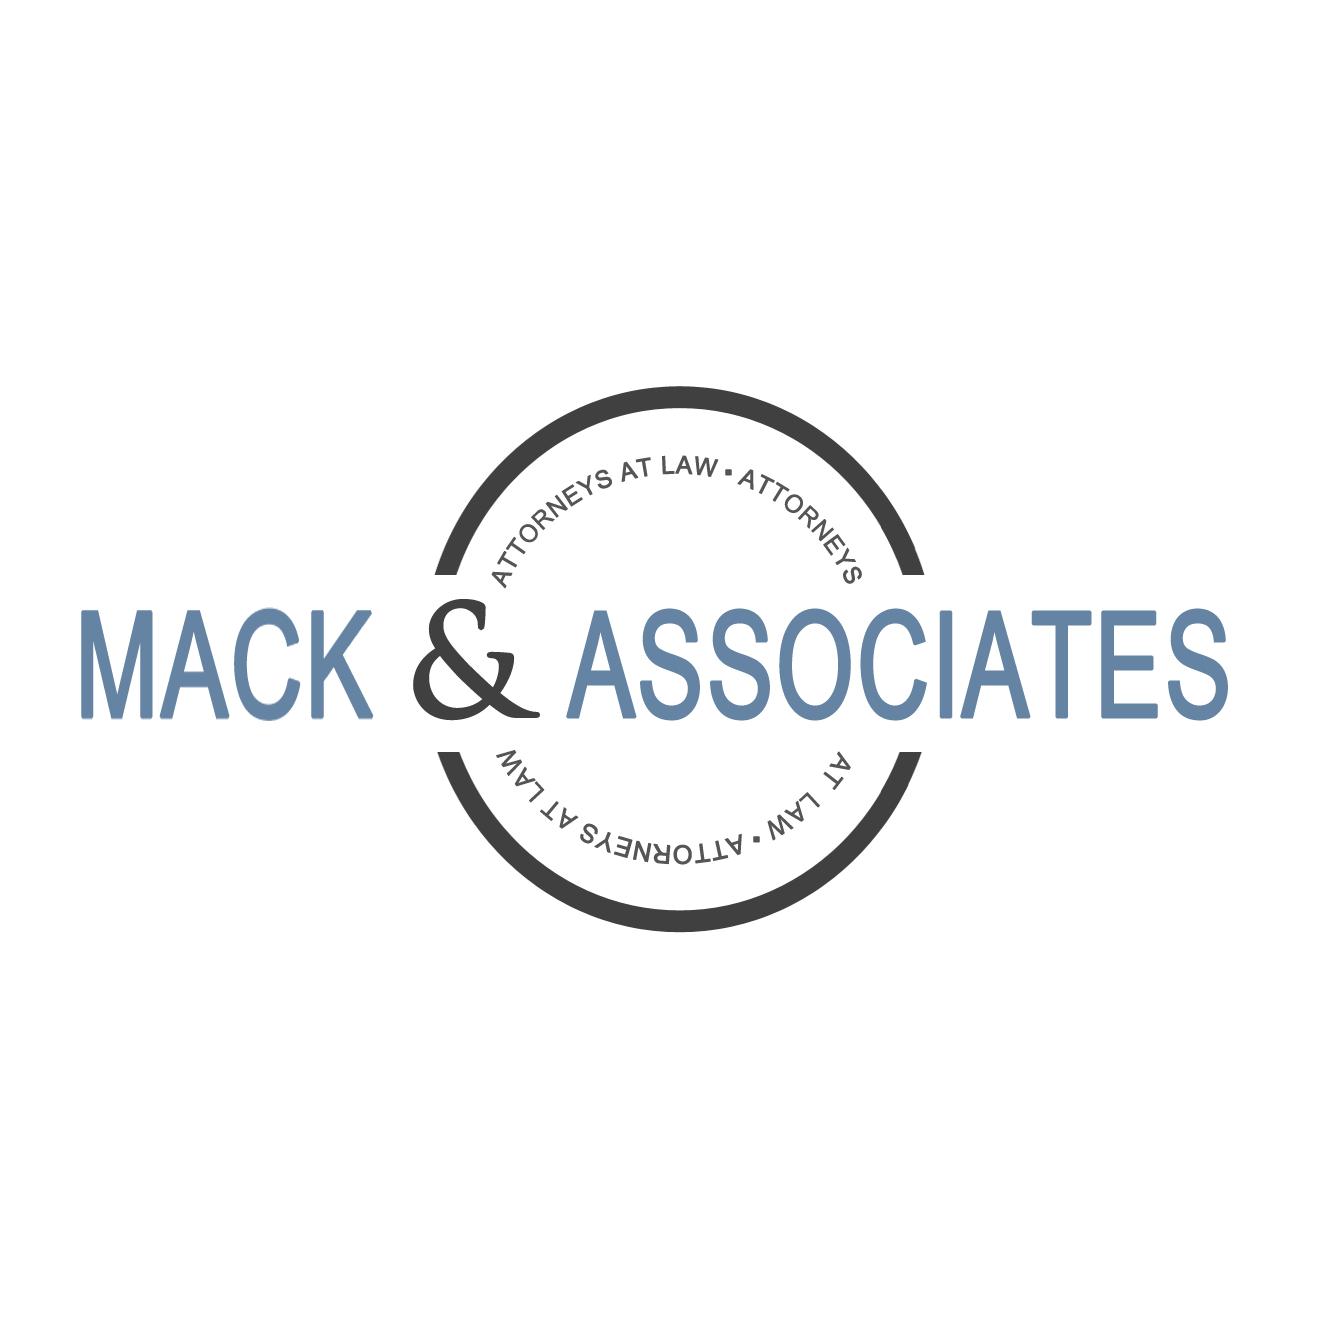 Mack & Associates, LLC